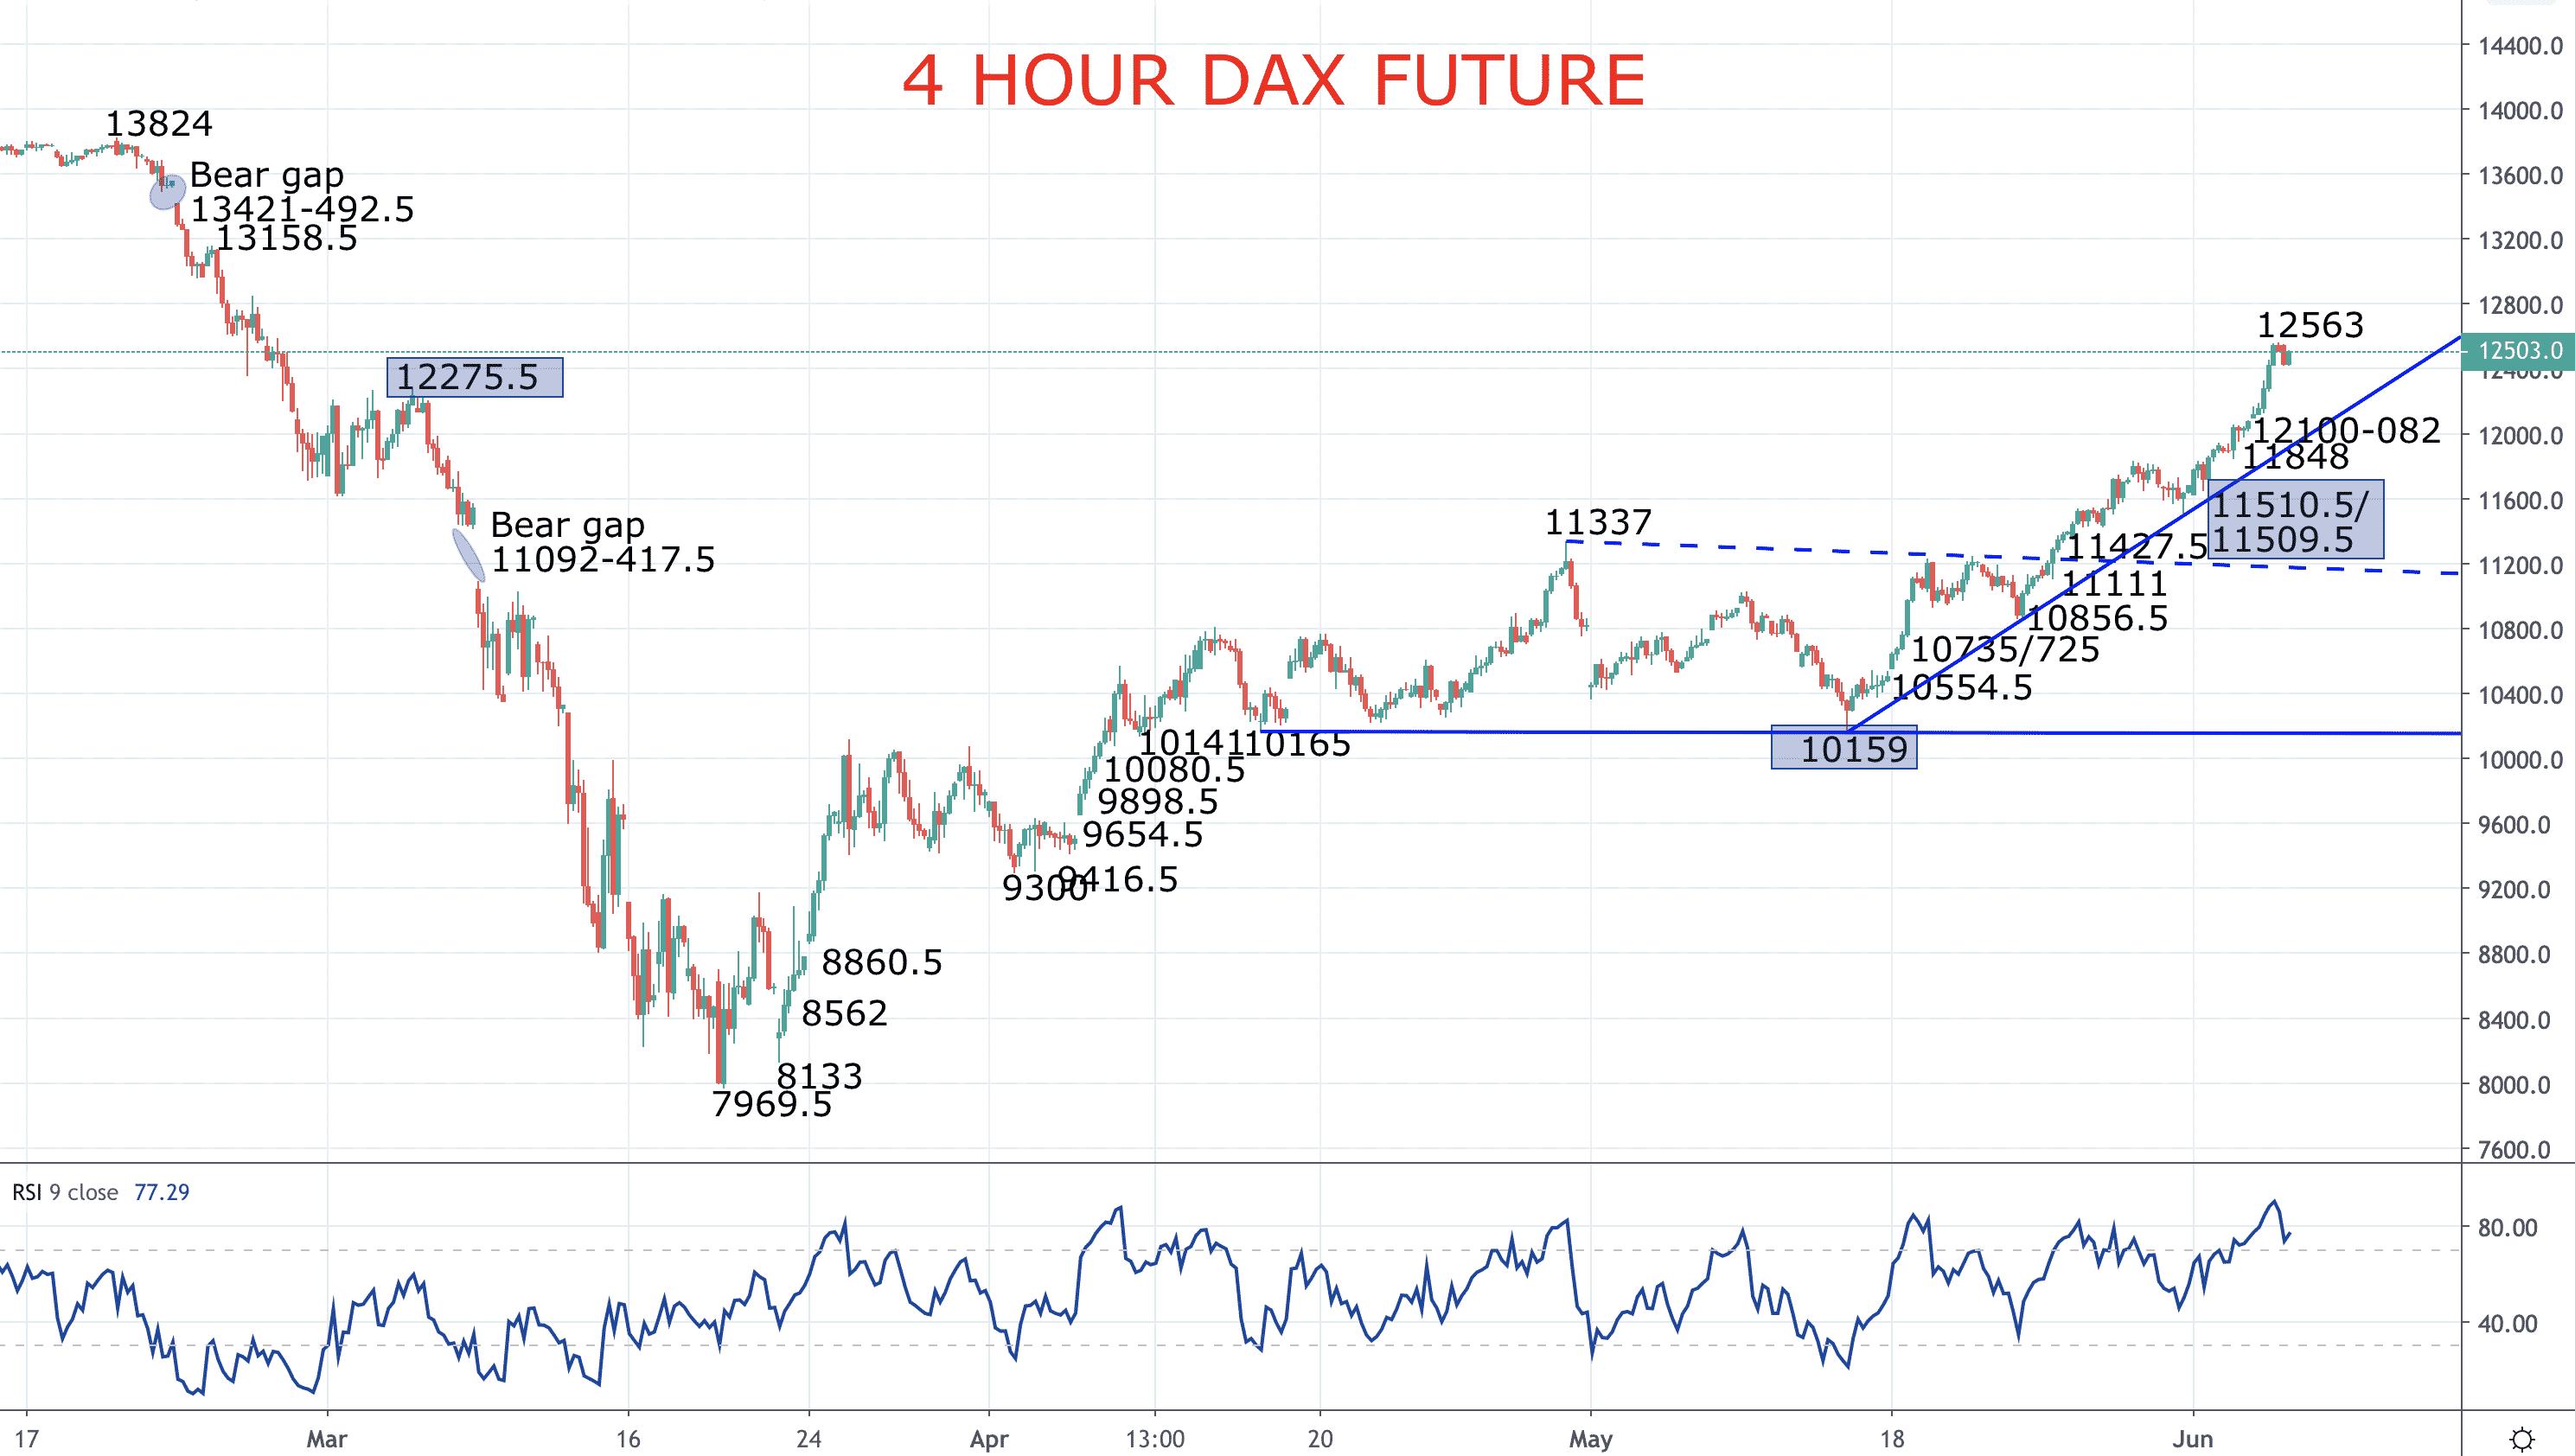 DAX sends bigger bull signal! – DAX Forecast Image